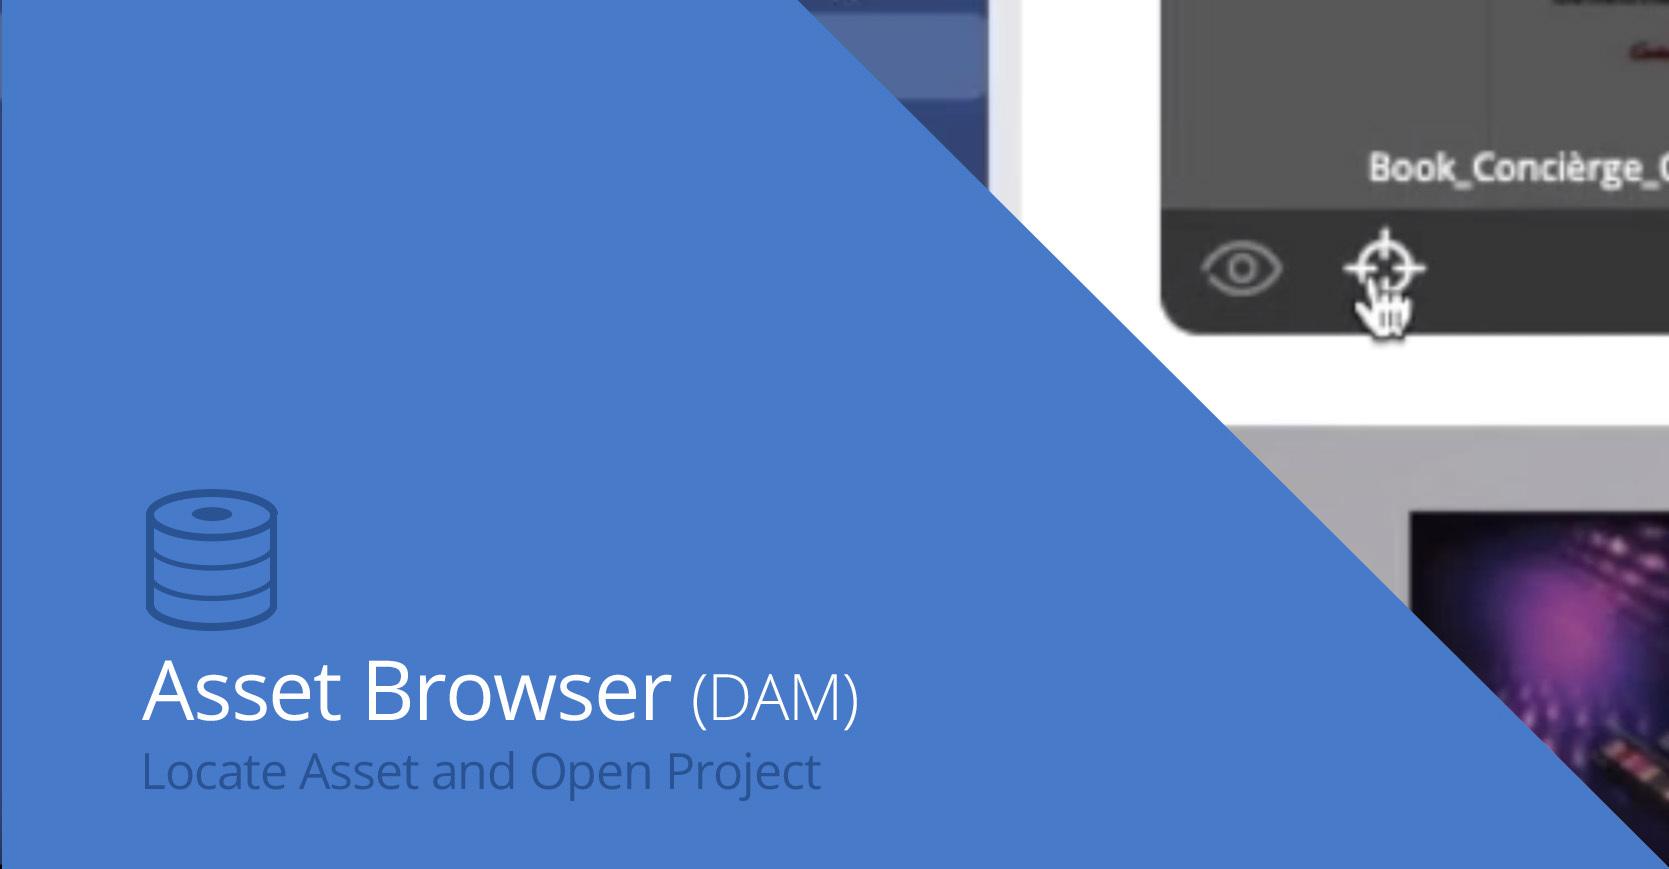 3.DAM_Reveal_Open